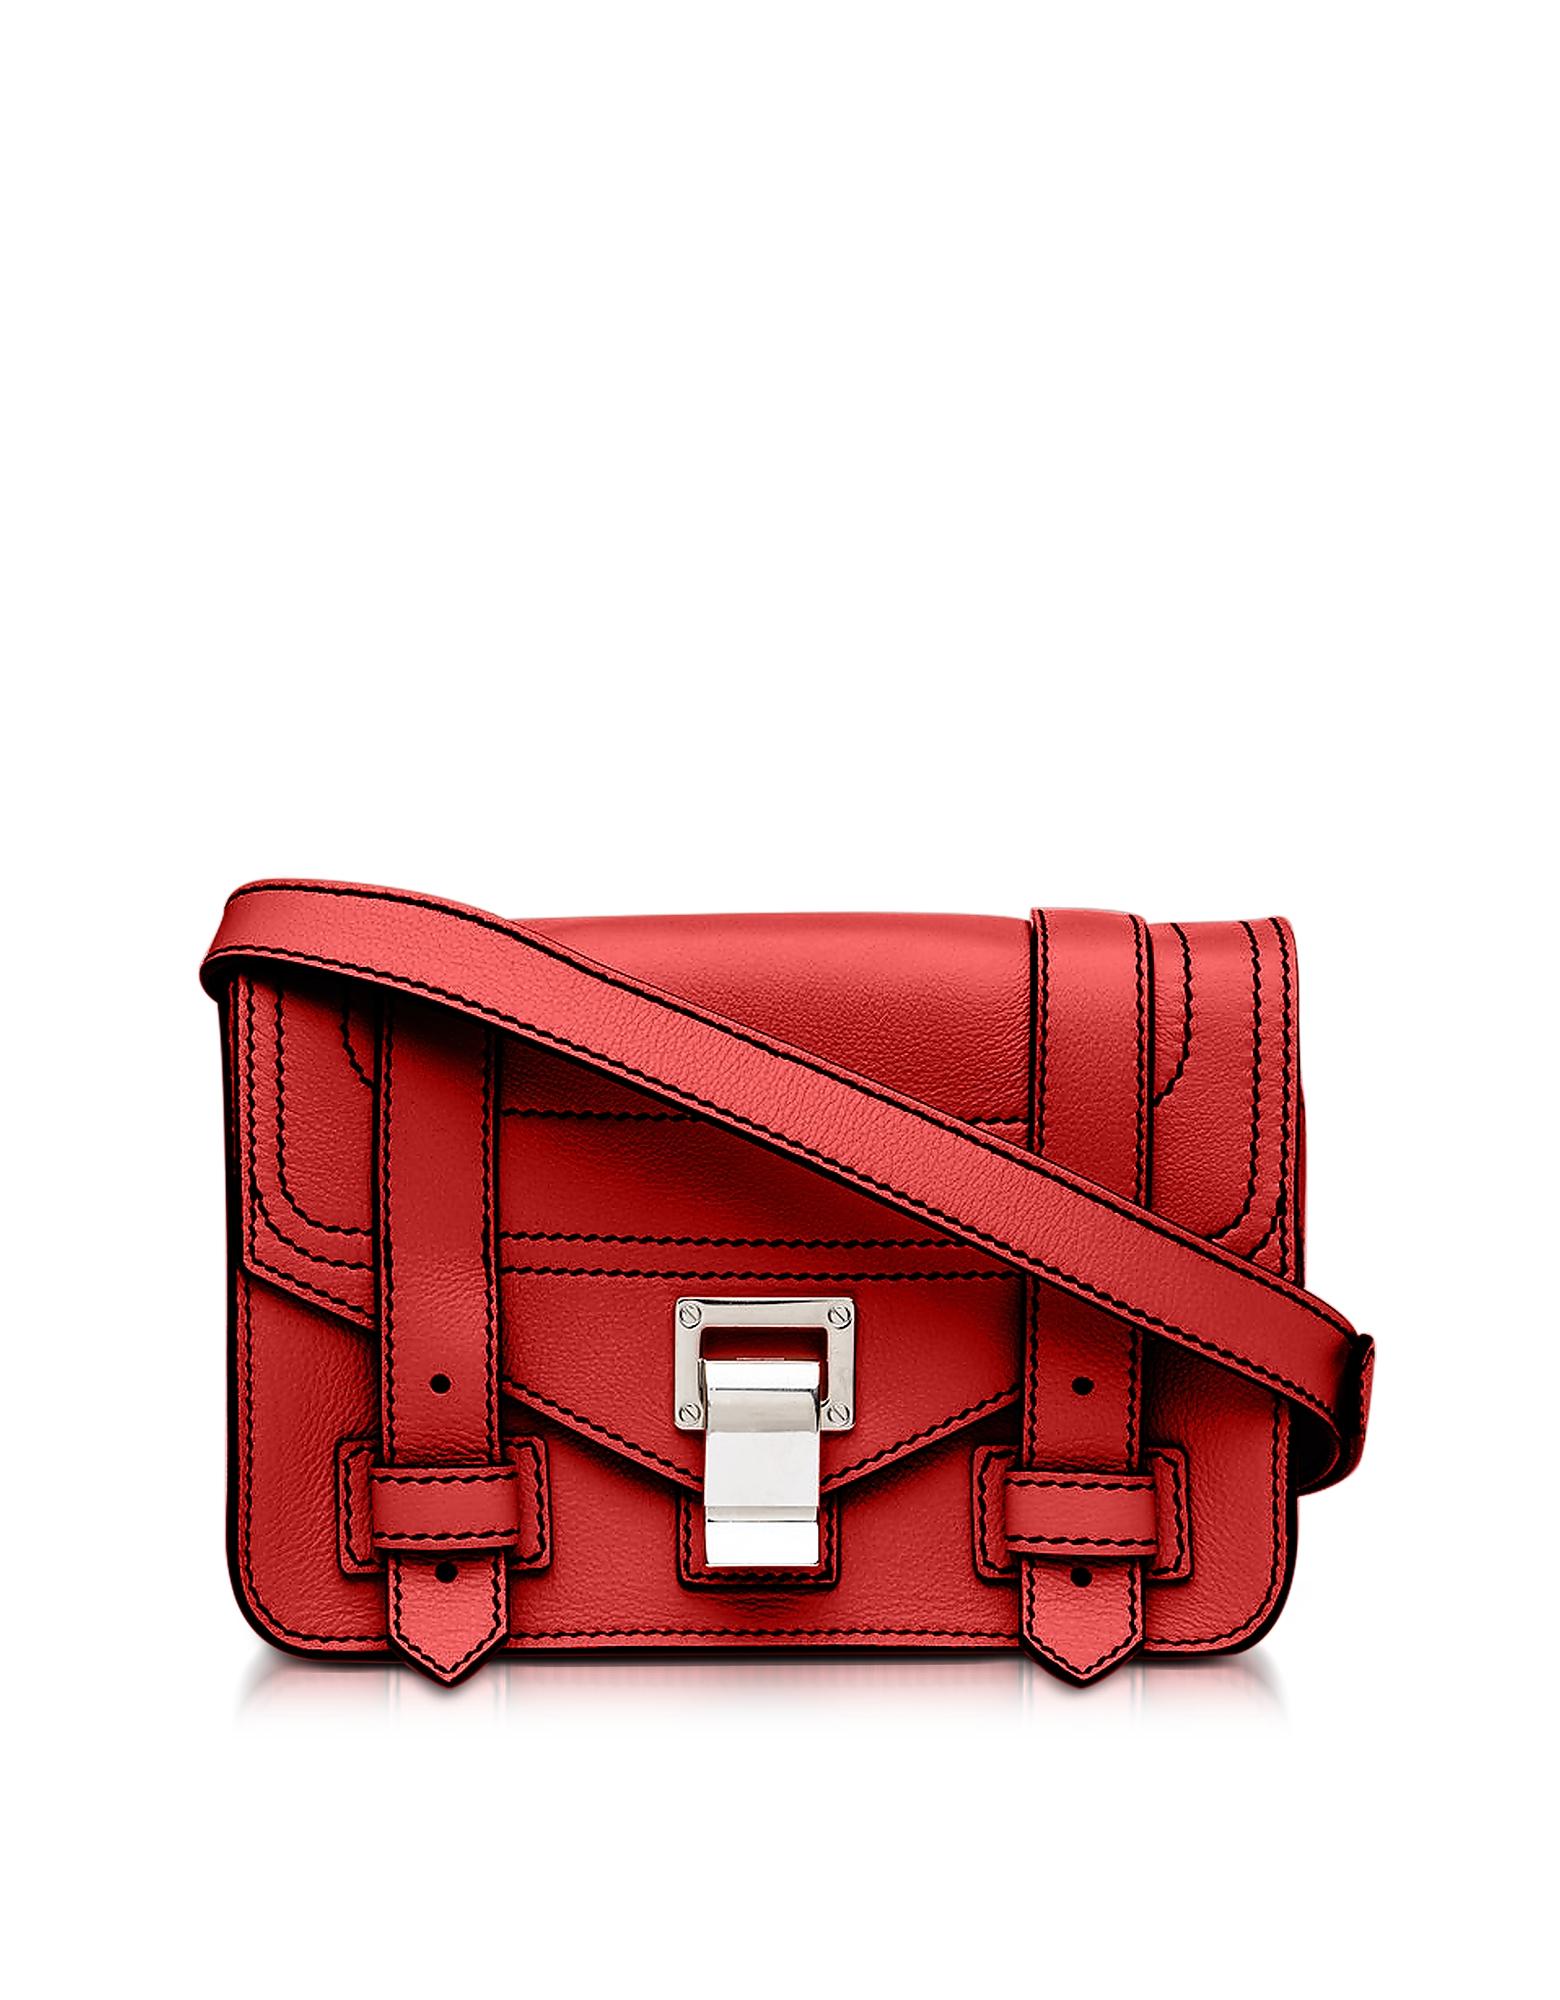 PS1+ Cardinal Grainy Leather Mini Crossbody Bag